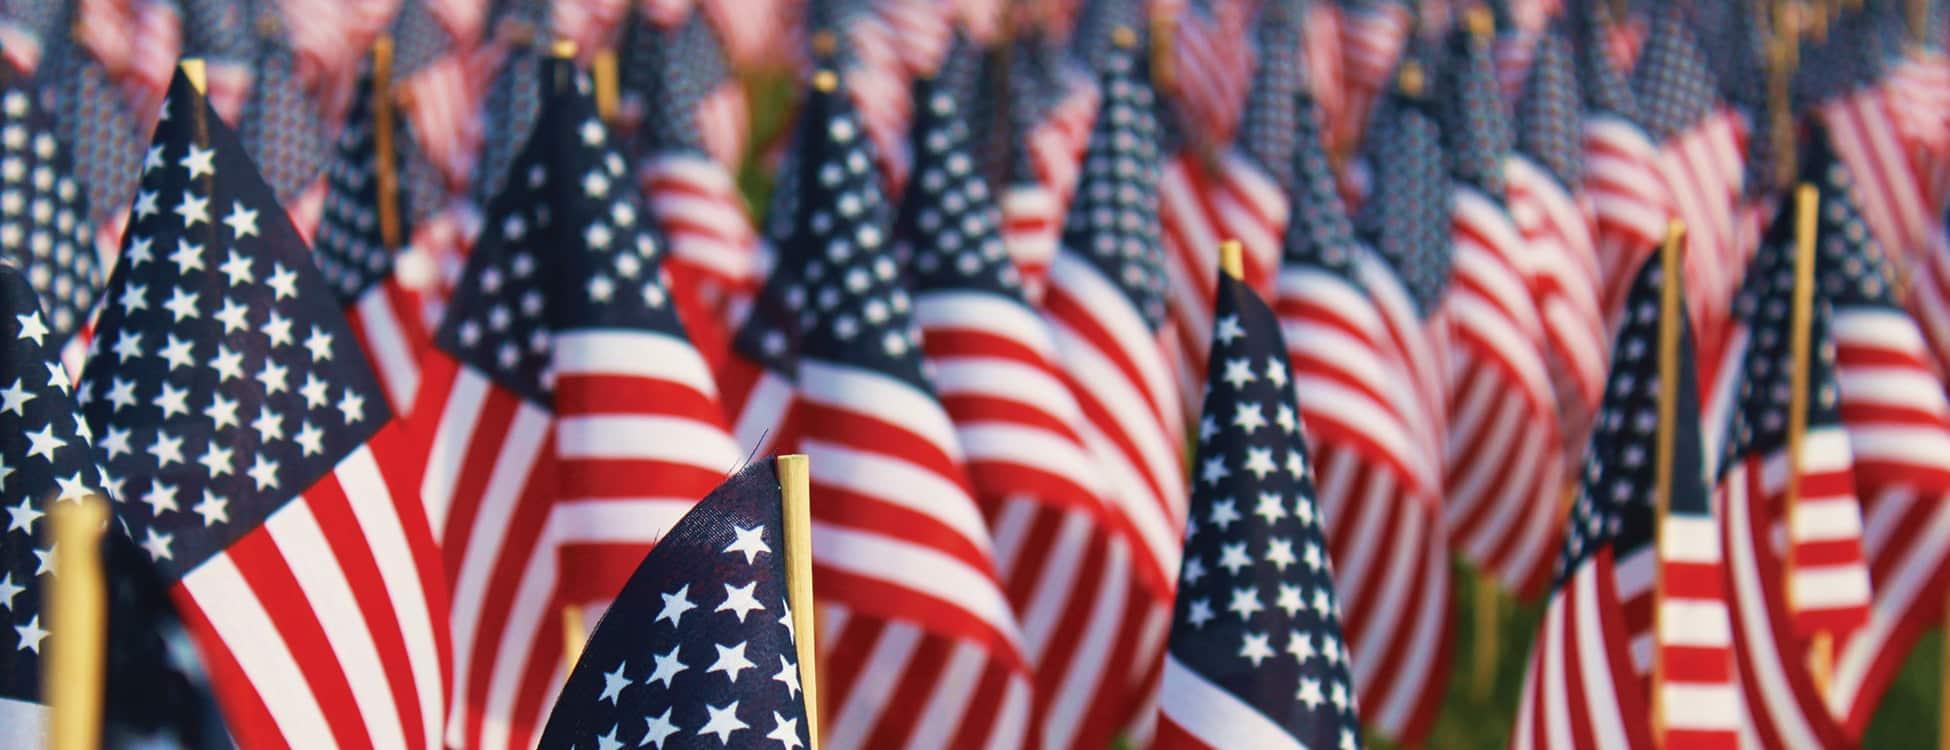 veterans, american flag, united states